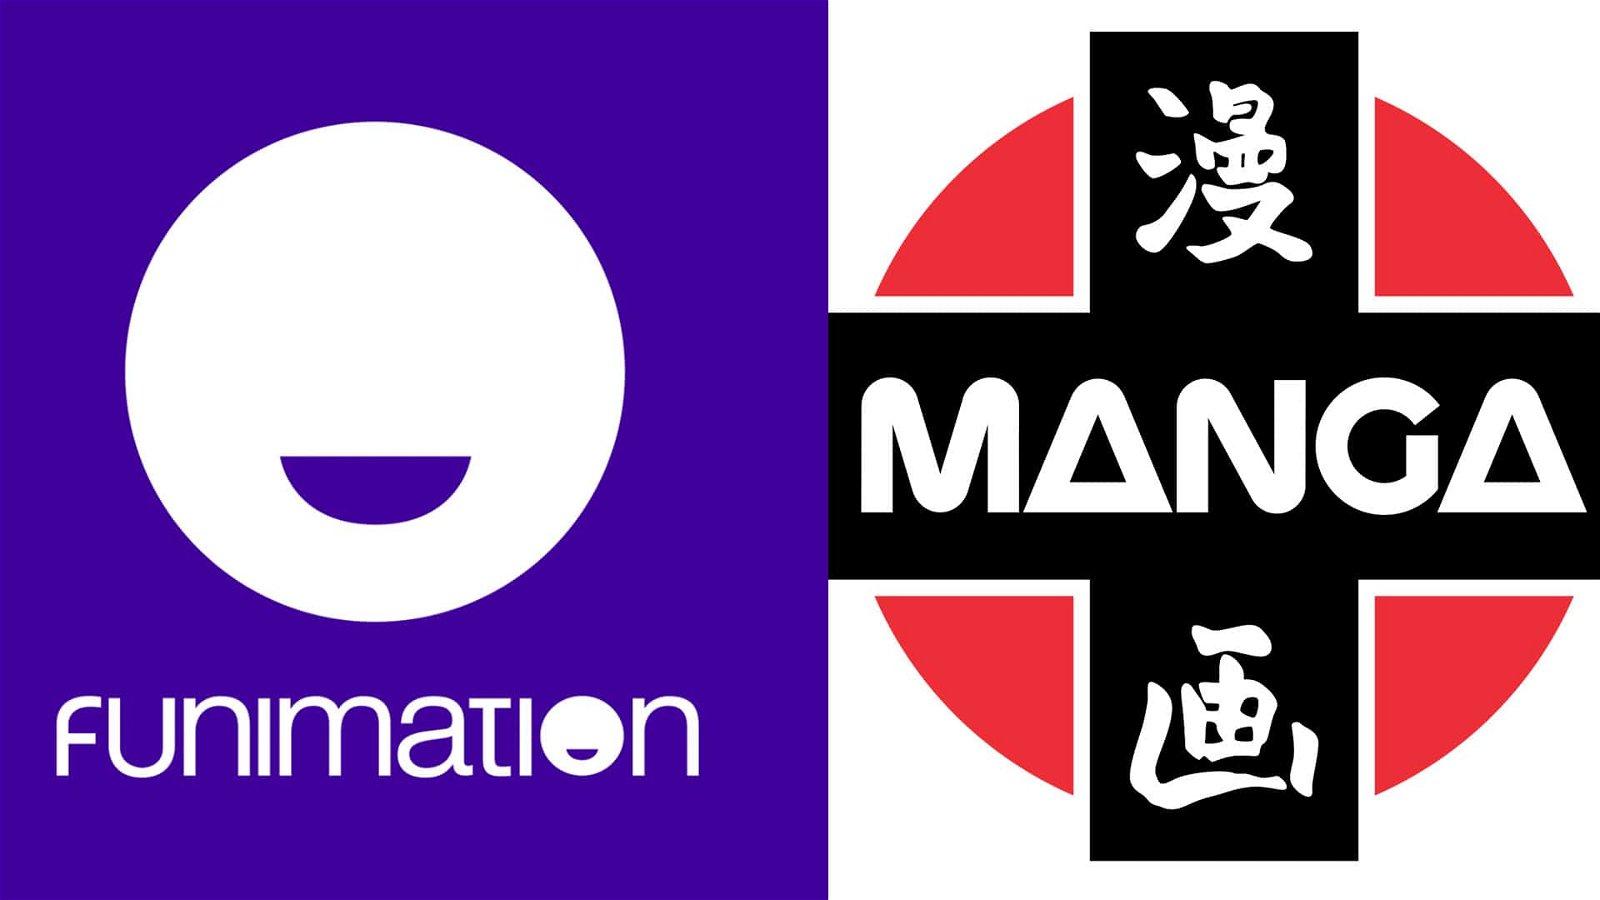 British Anime Distributor Manga Entertainment Acquired by Funimation 1